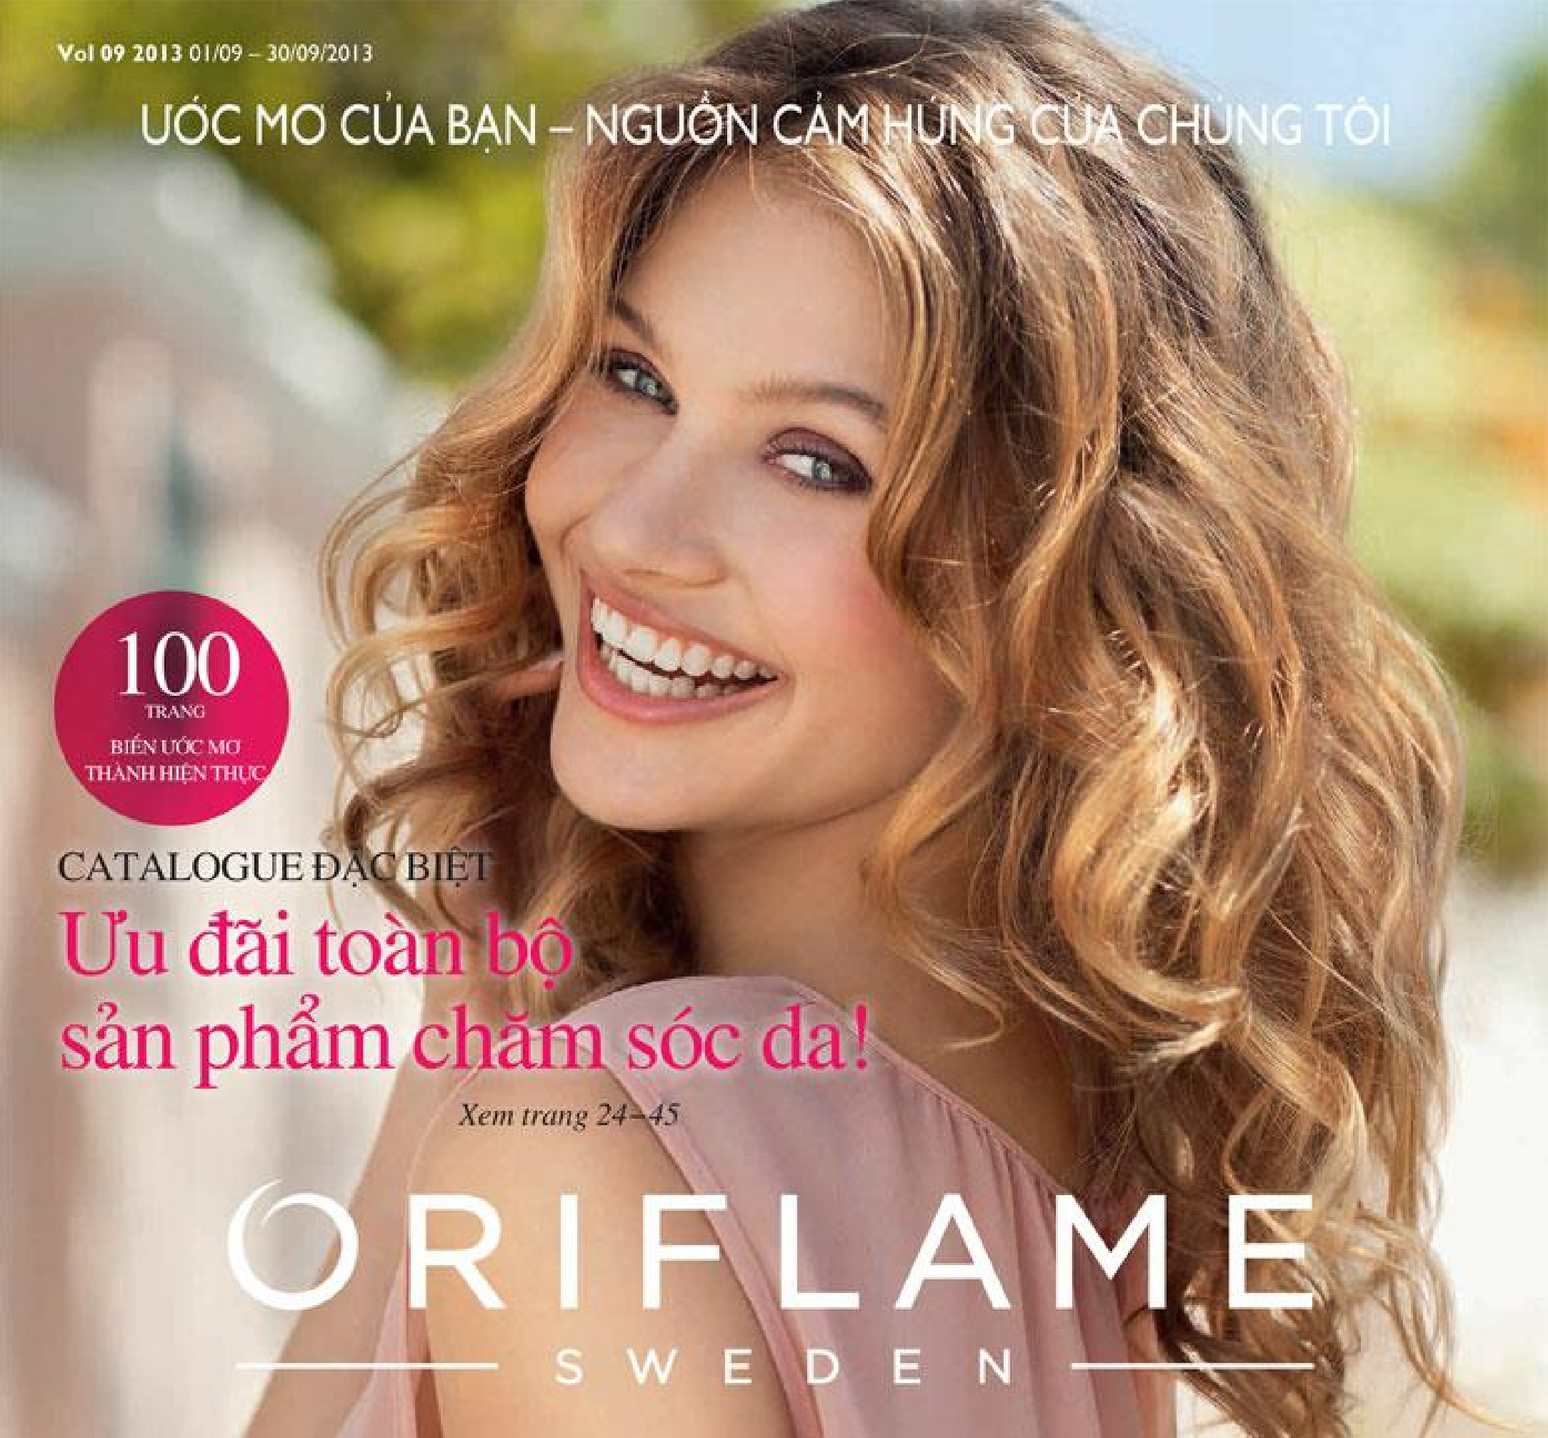 Catalogue My Pham Oriflame 9-2013